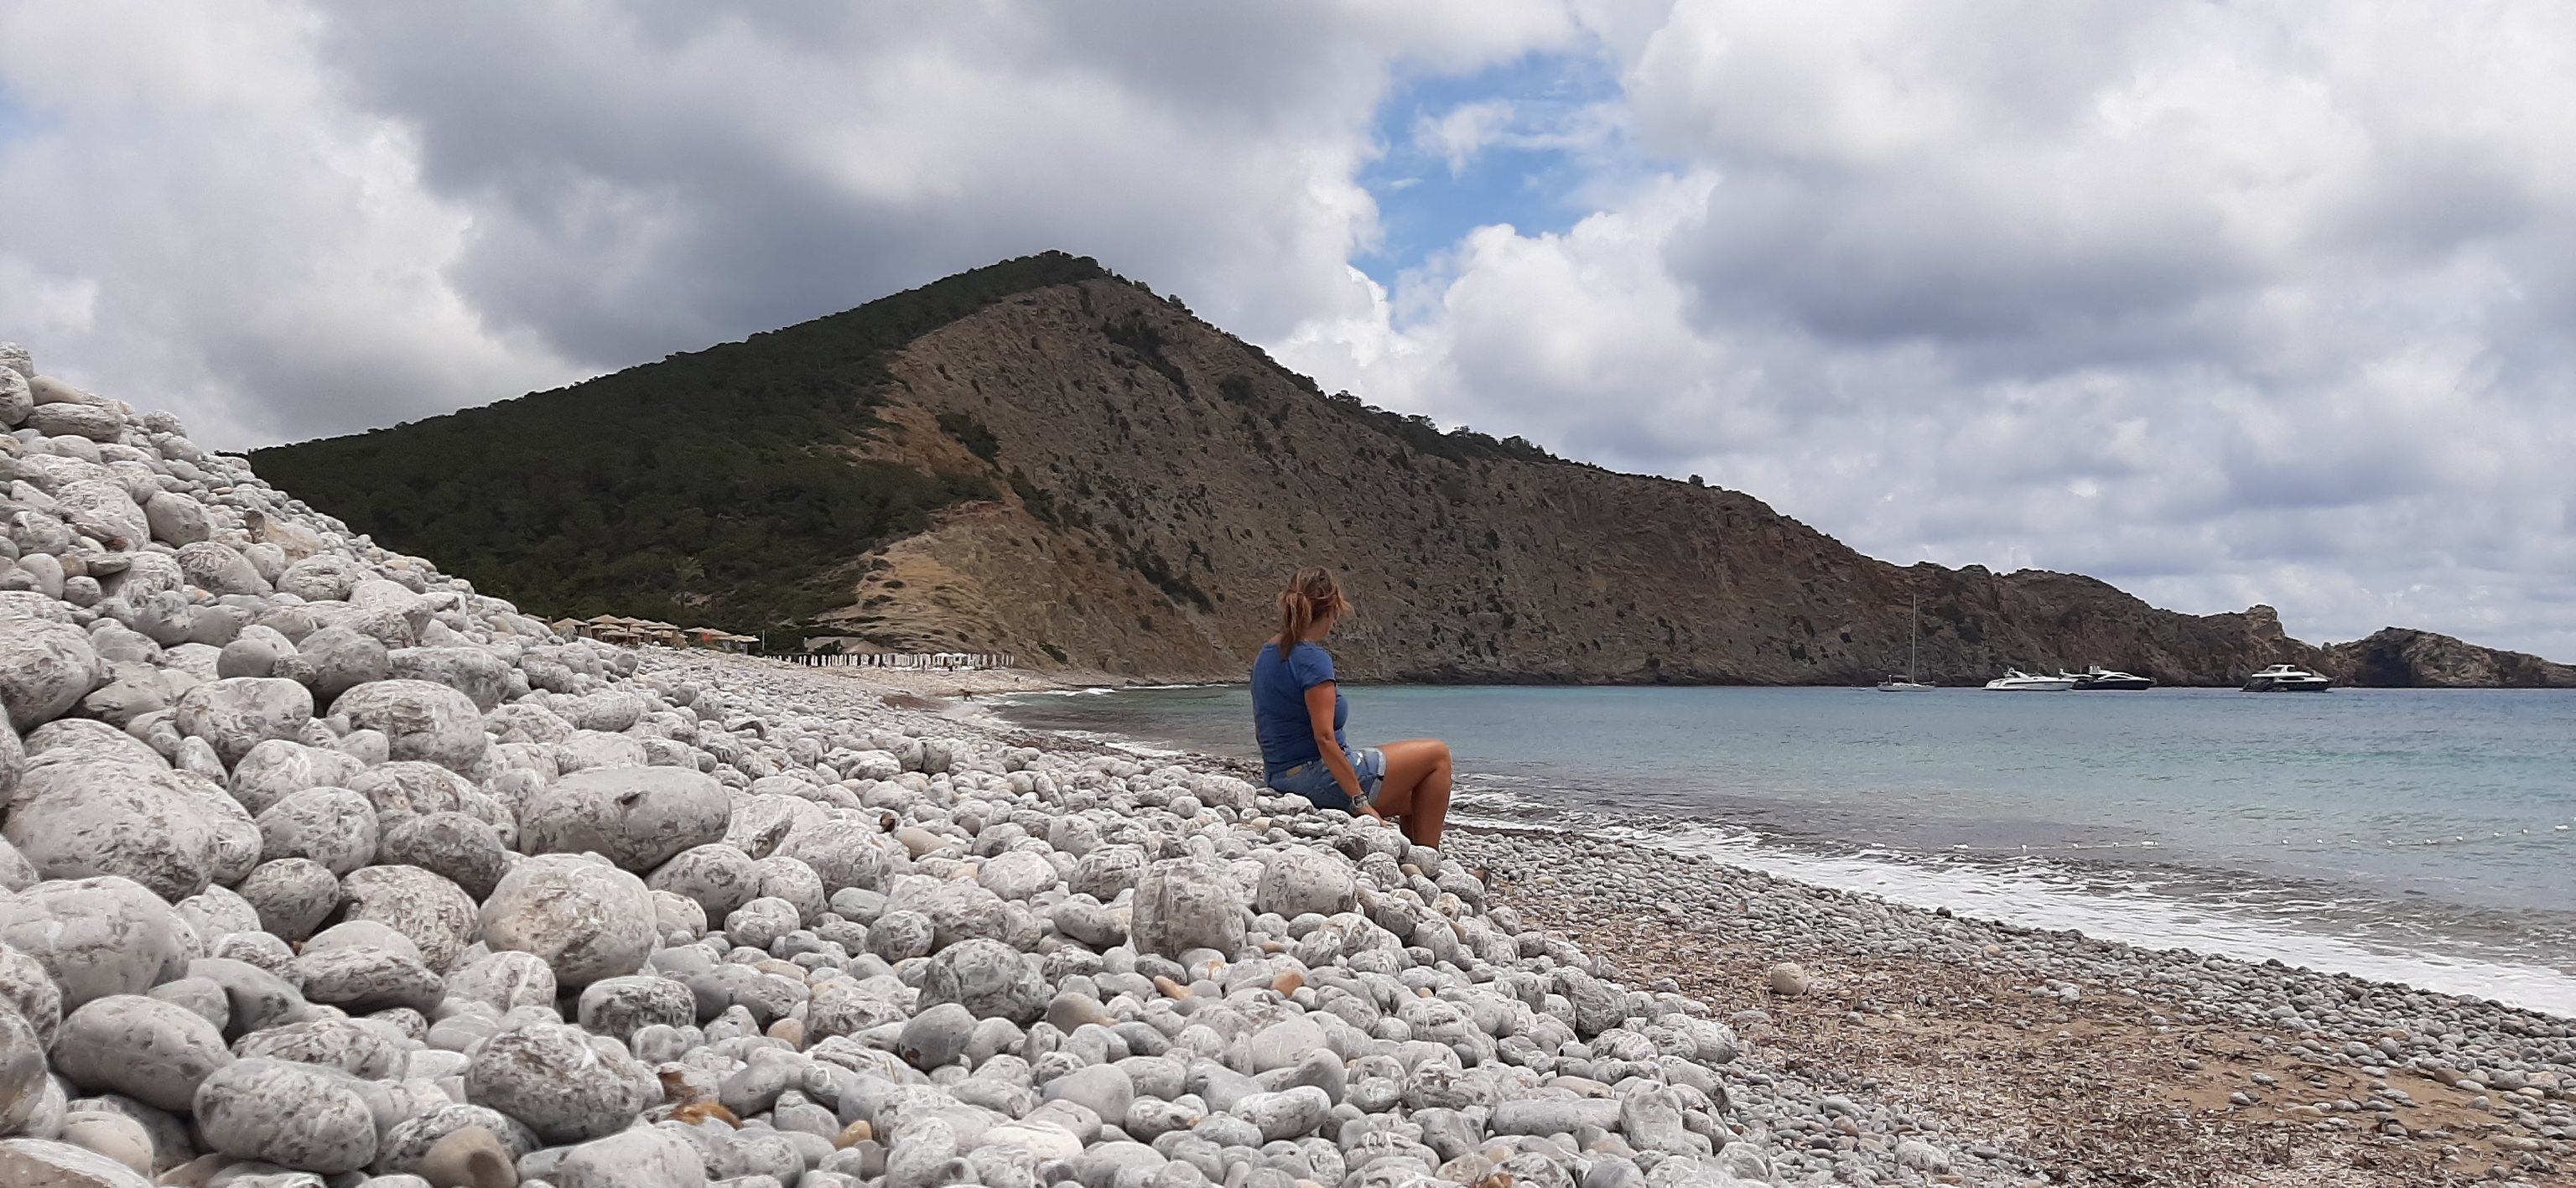 Cala Jondal, Ibiza, 25 de mayo 2021